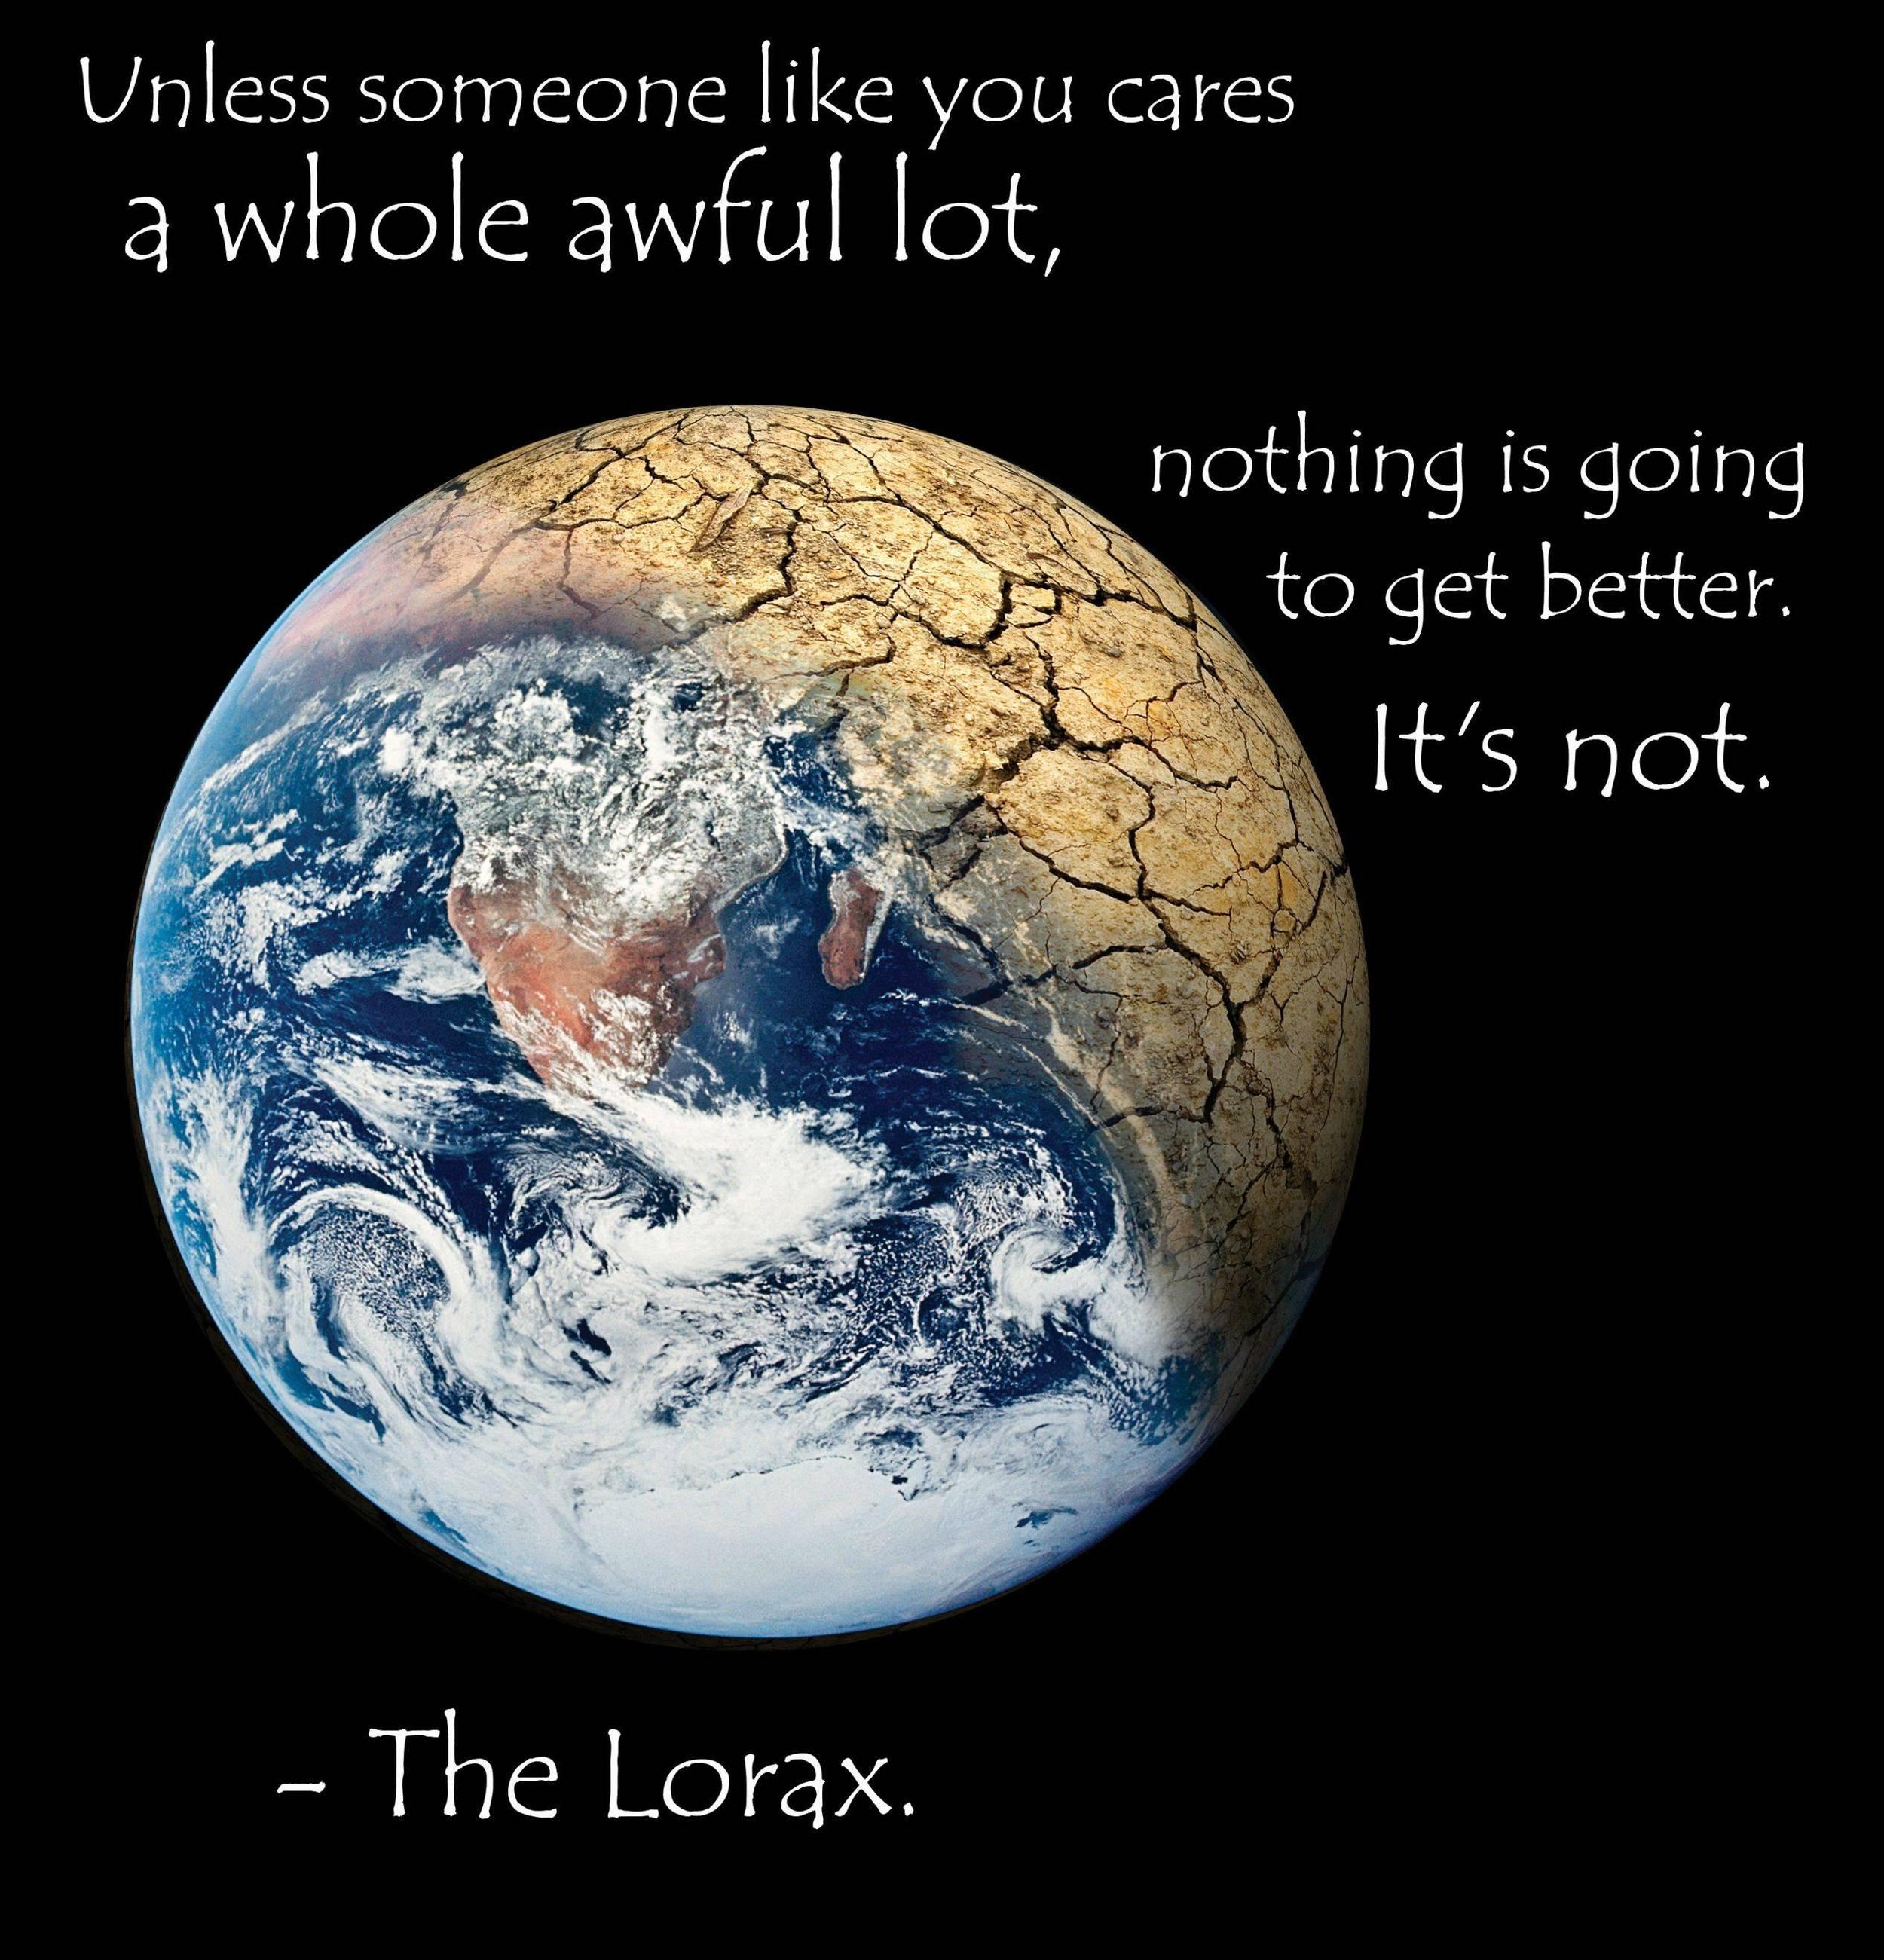 Unless Globe